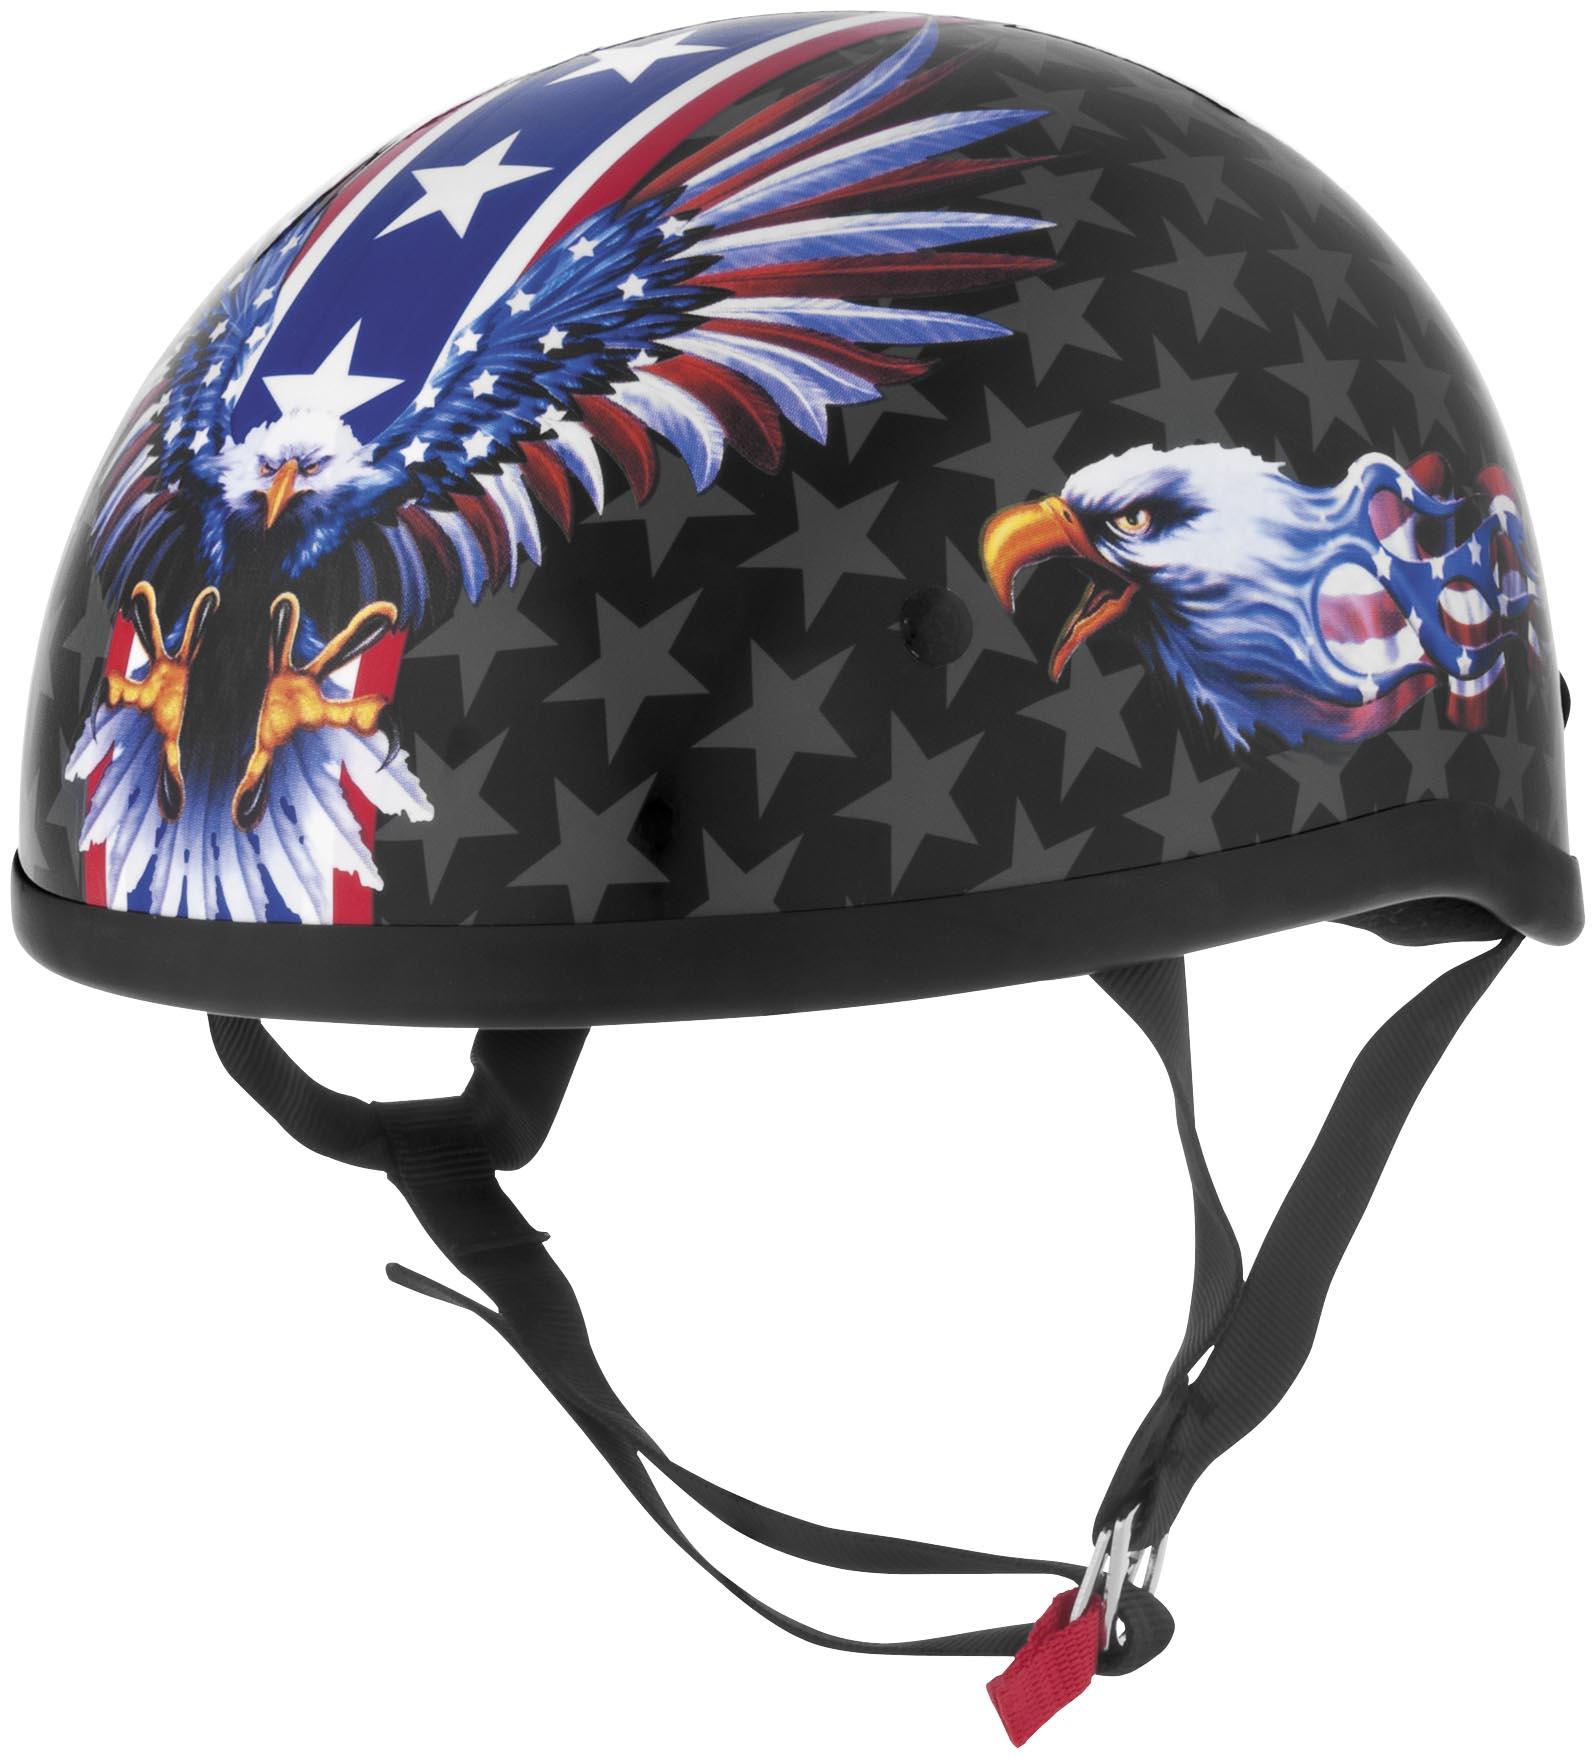 Original US Flame Graphics Helmet